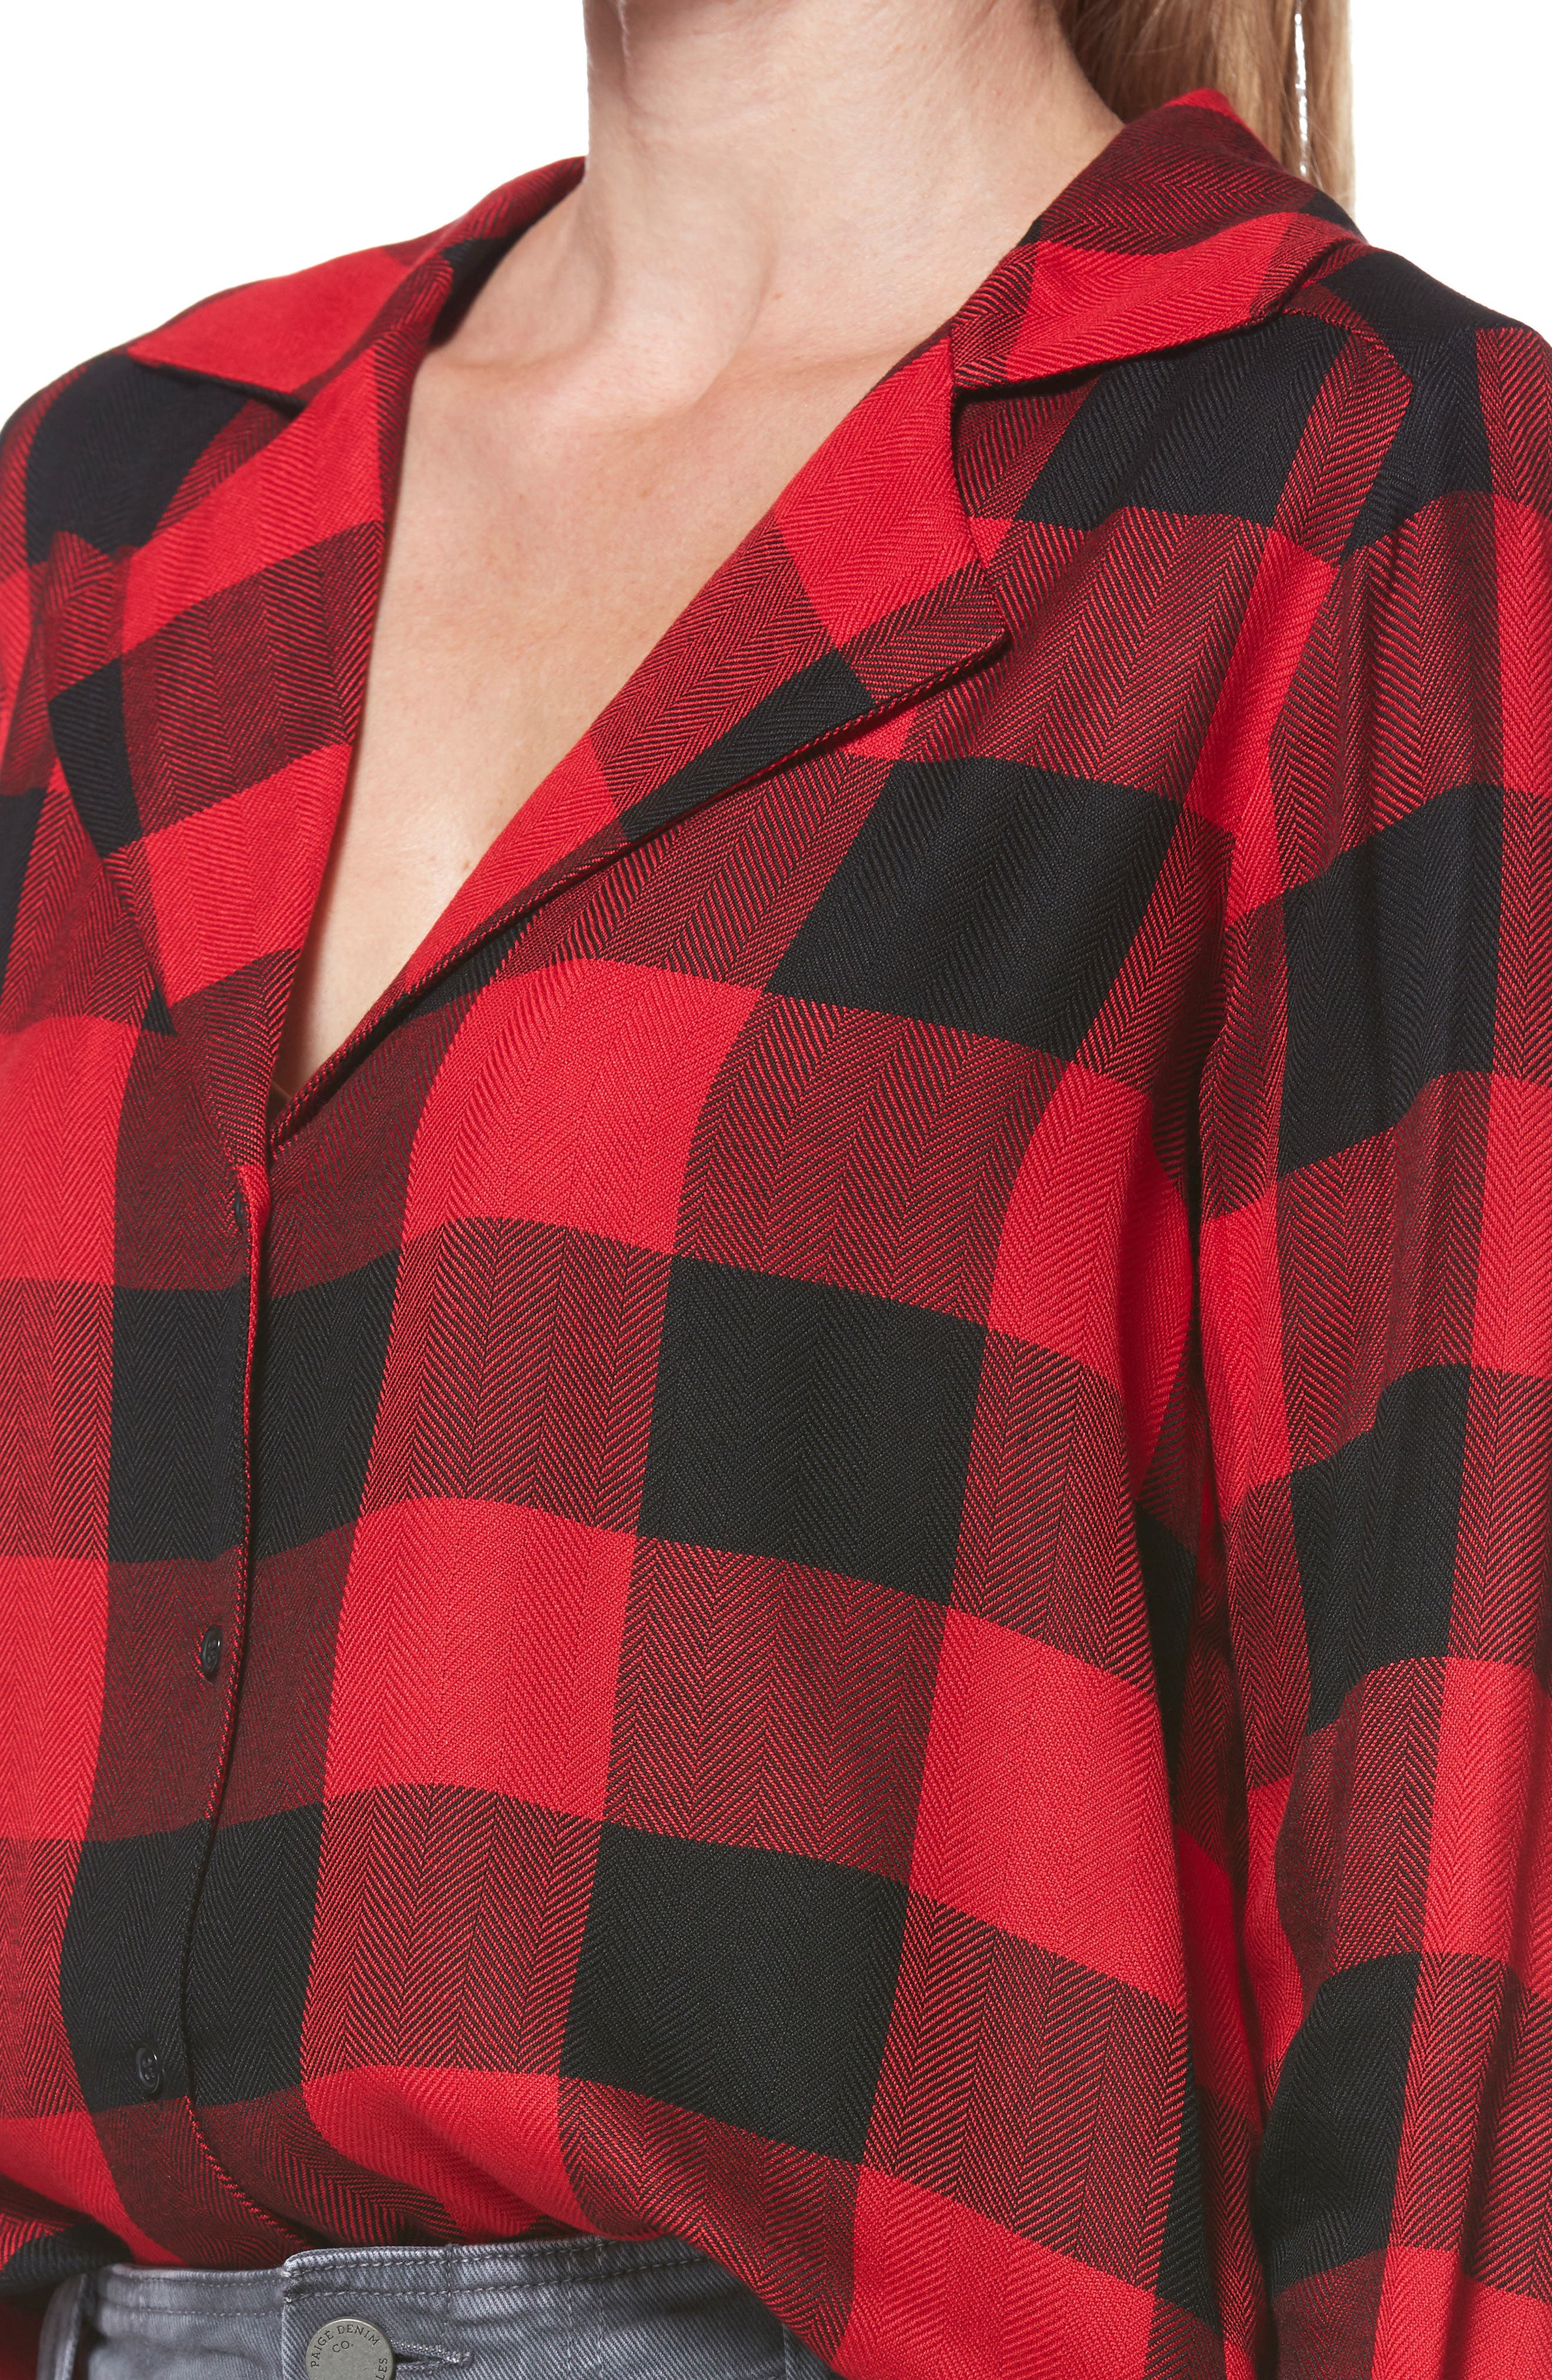 PAIGE,                             Elora Shirt,                             Alternate thumbnail 4, color,                             TRUE RED / BLACK